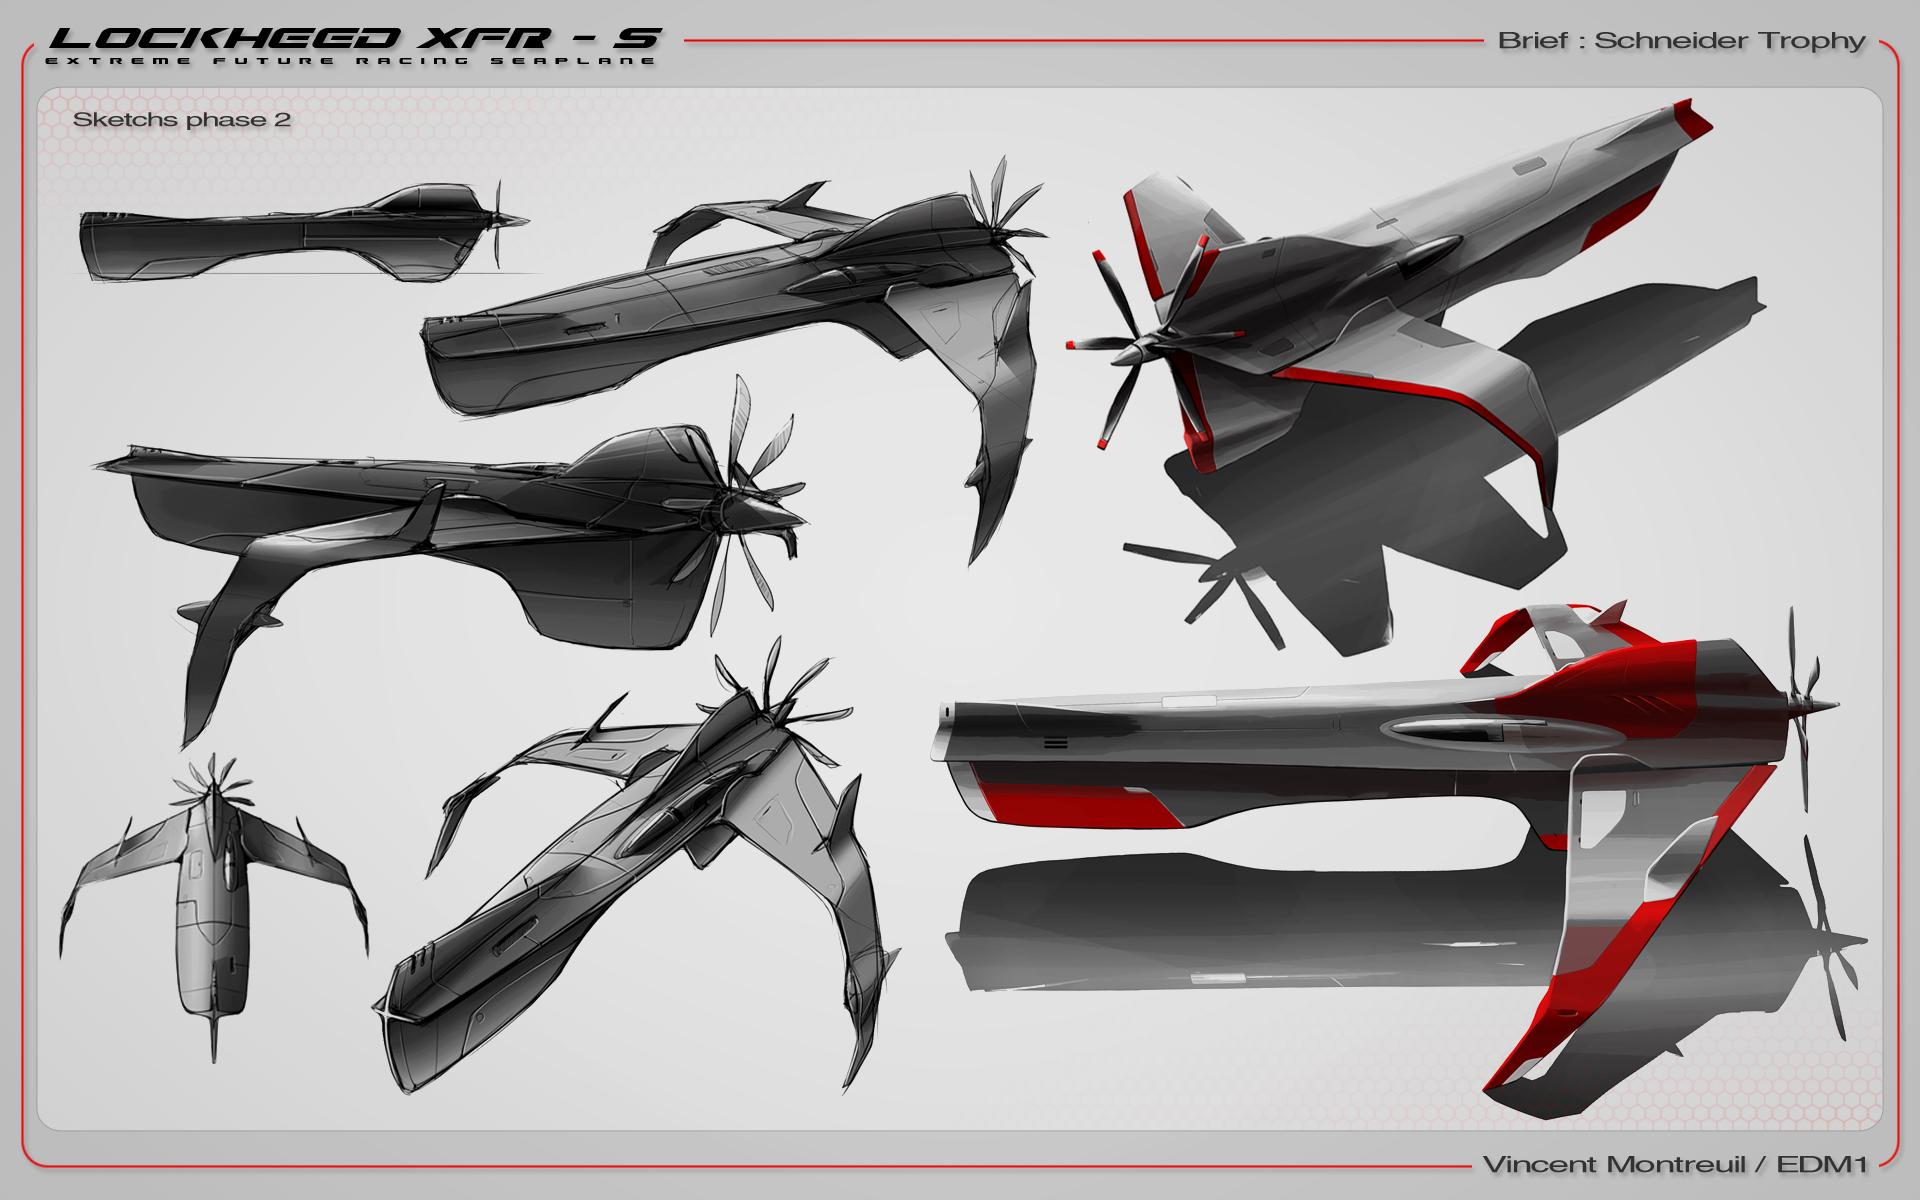 Presentation Seaplane 05 by Vincent-Montreuil